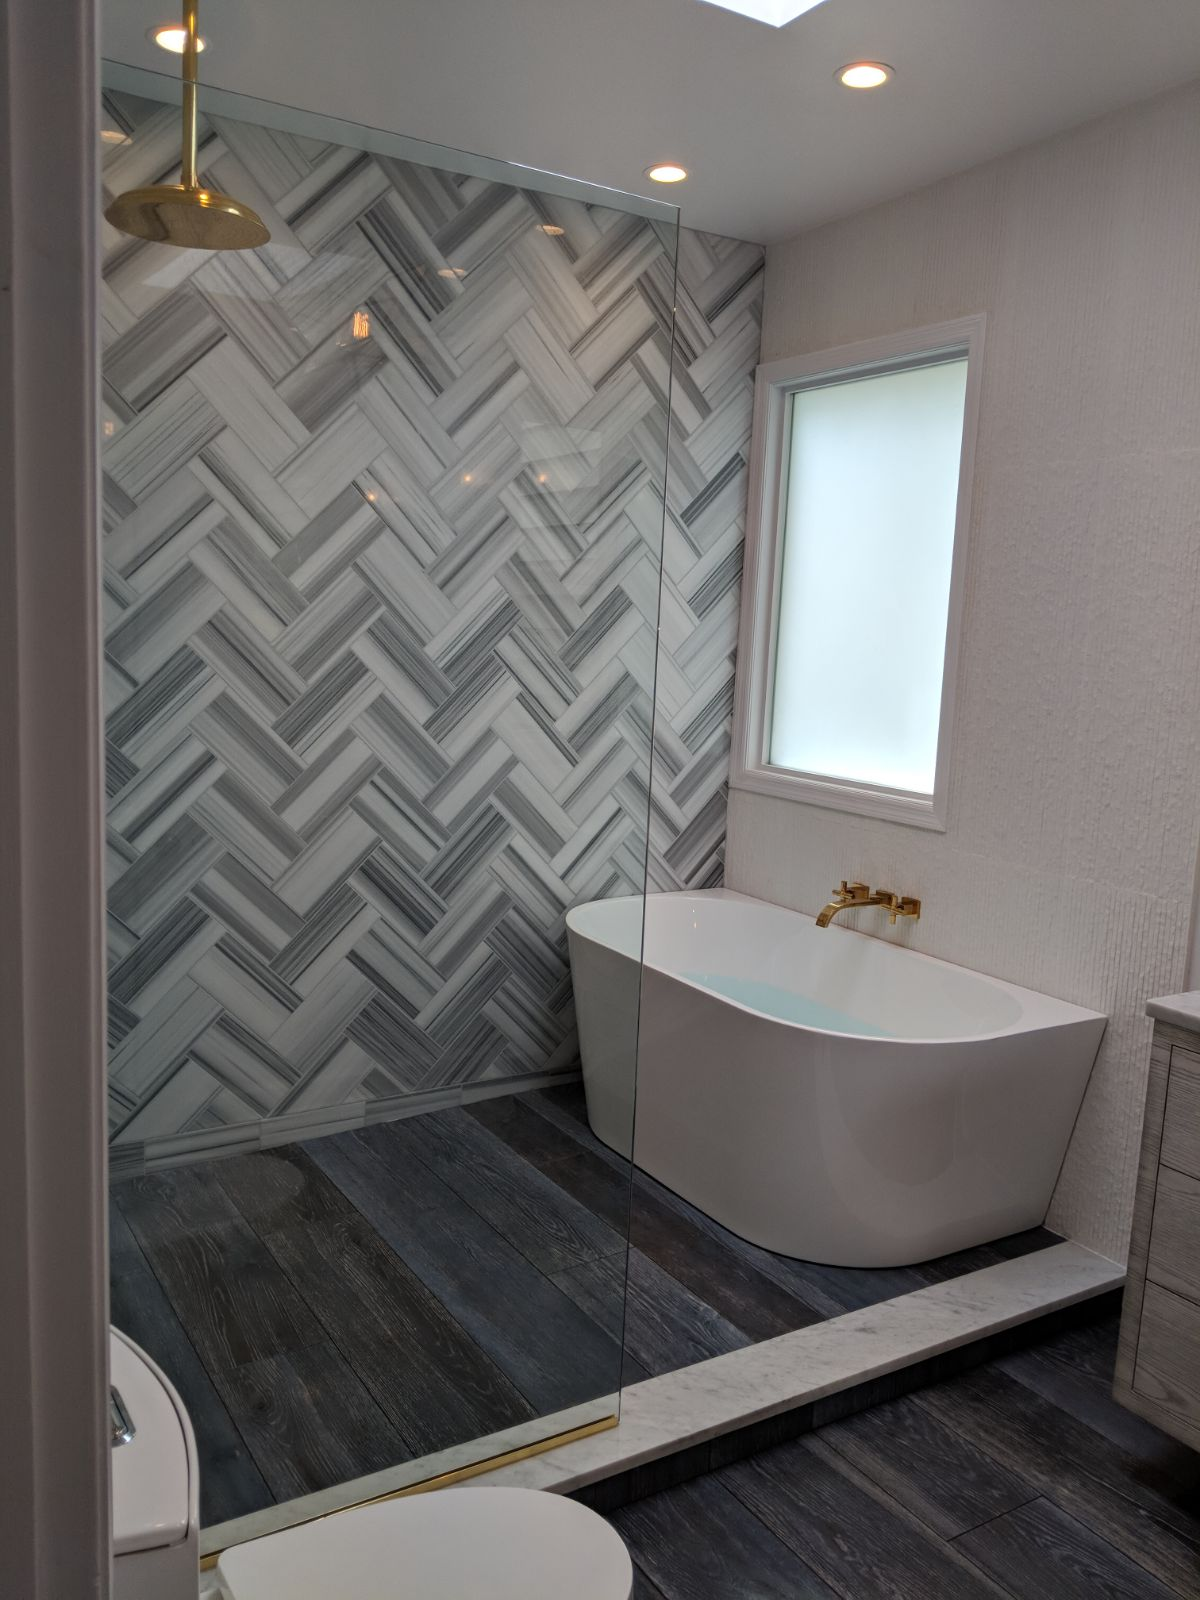 Full Bathroom Renovaton in Jersey City, NJ